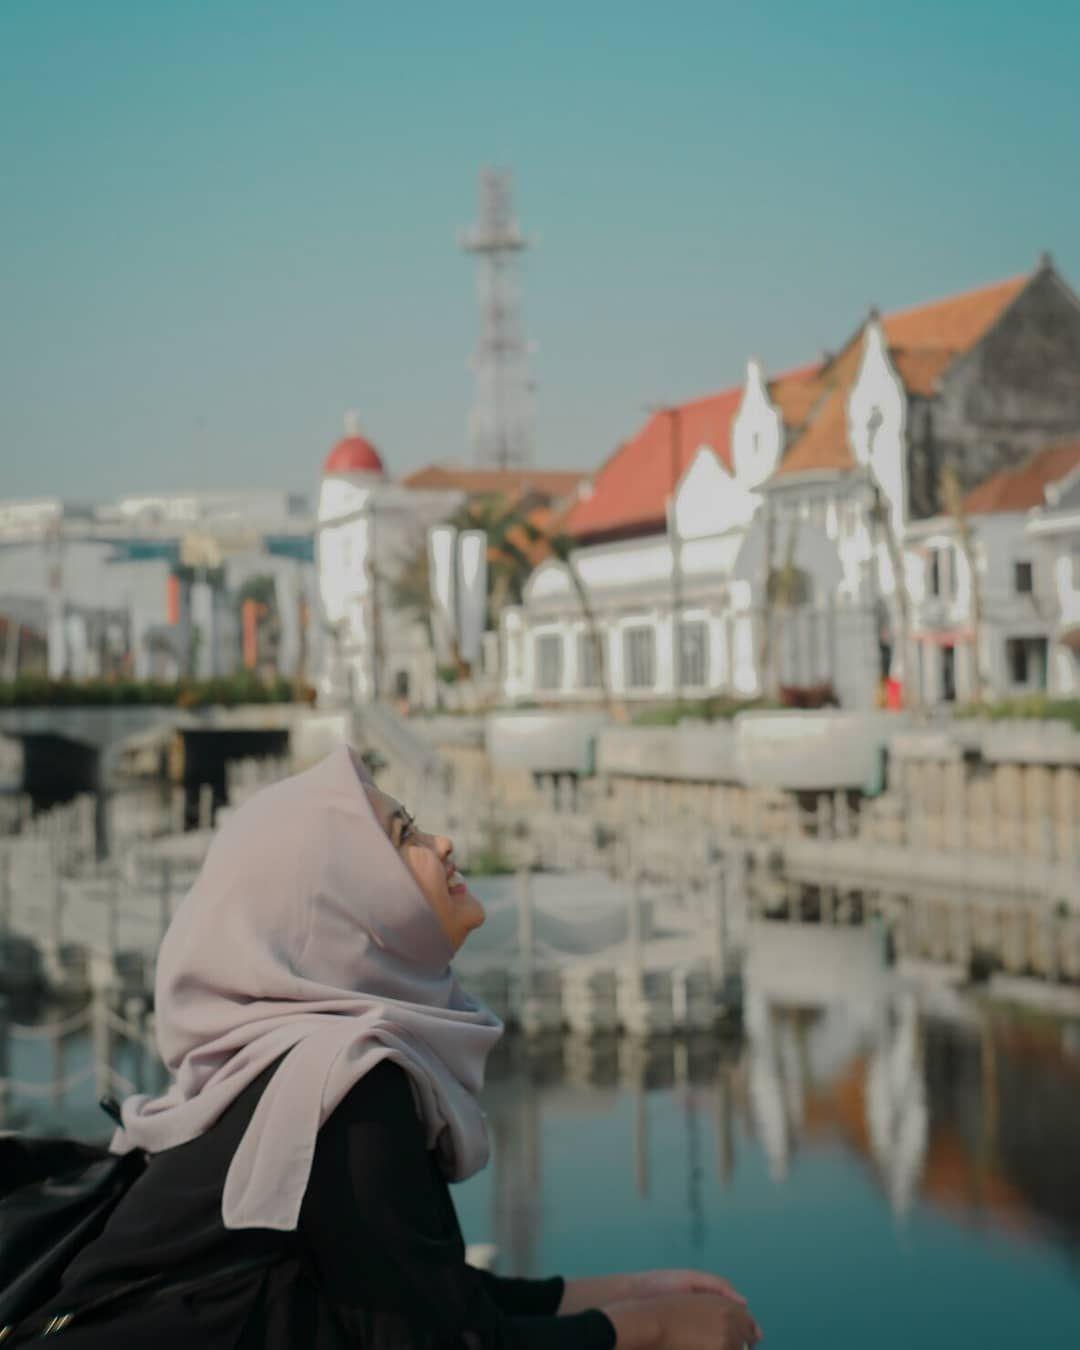 Spot foto di wisata Kota Tua Jakarta #kotatuajakarta #spotfoto